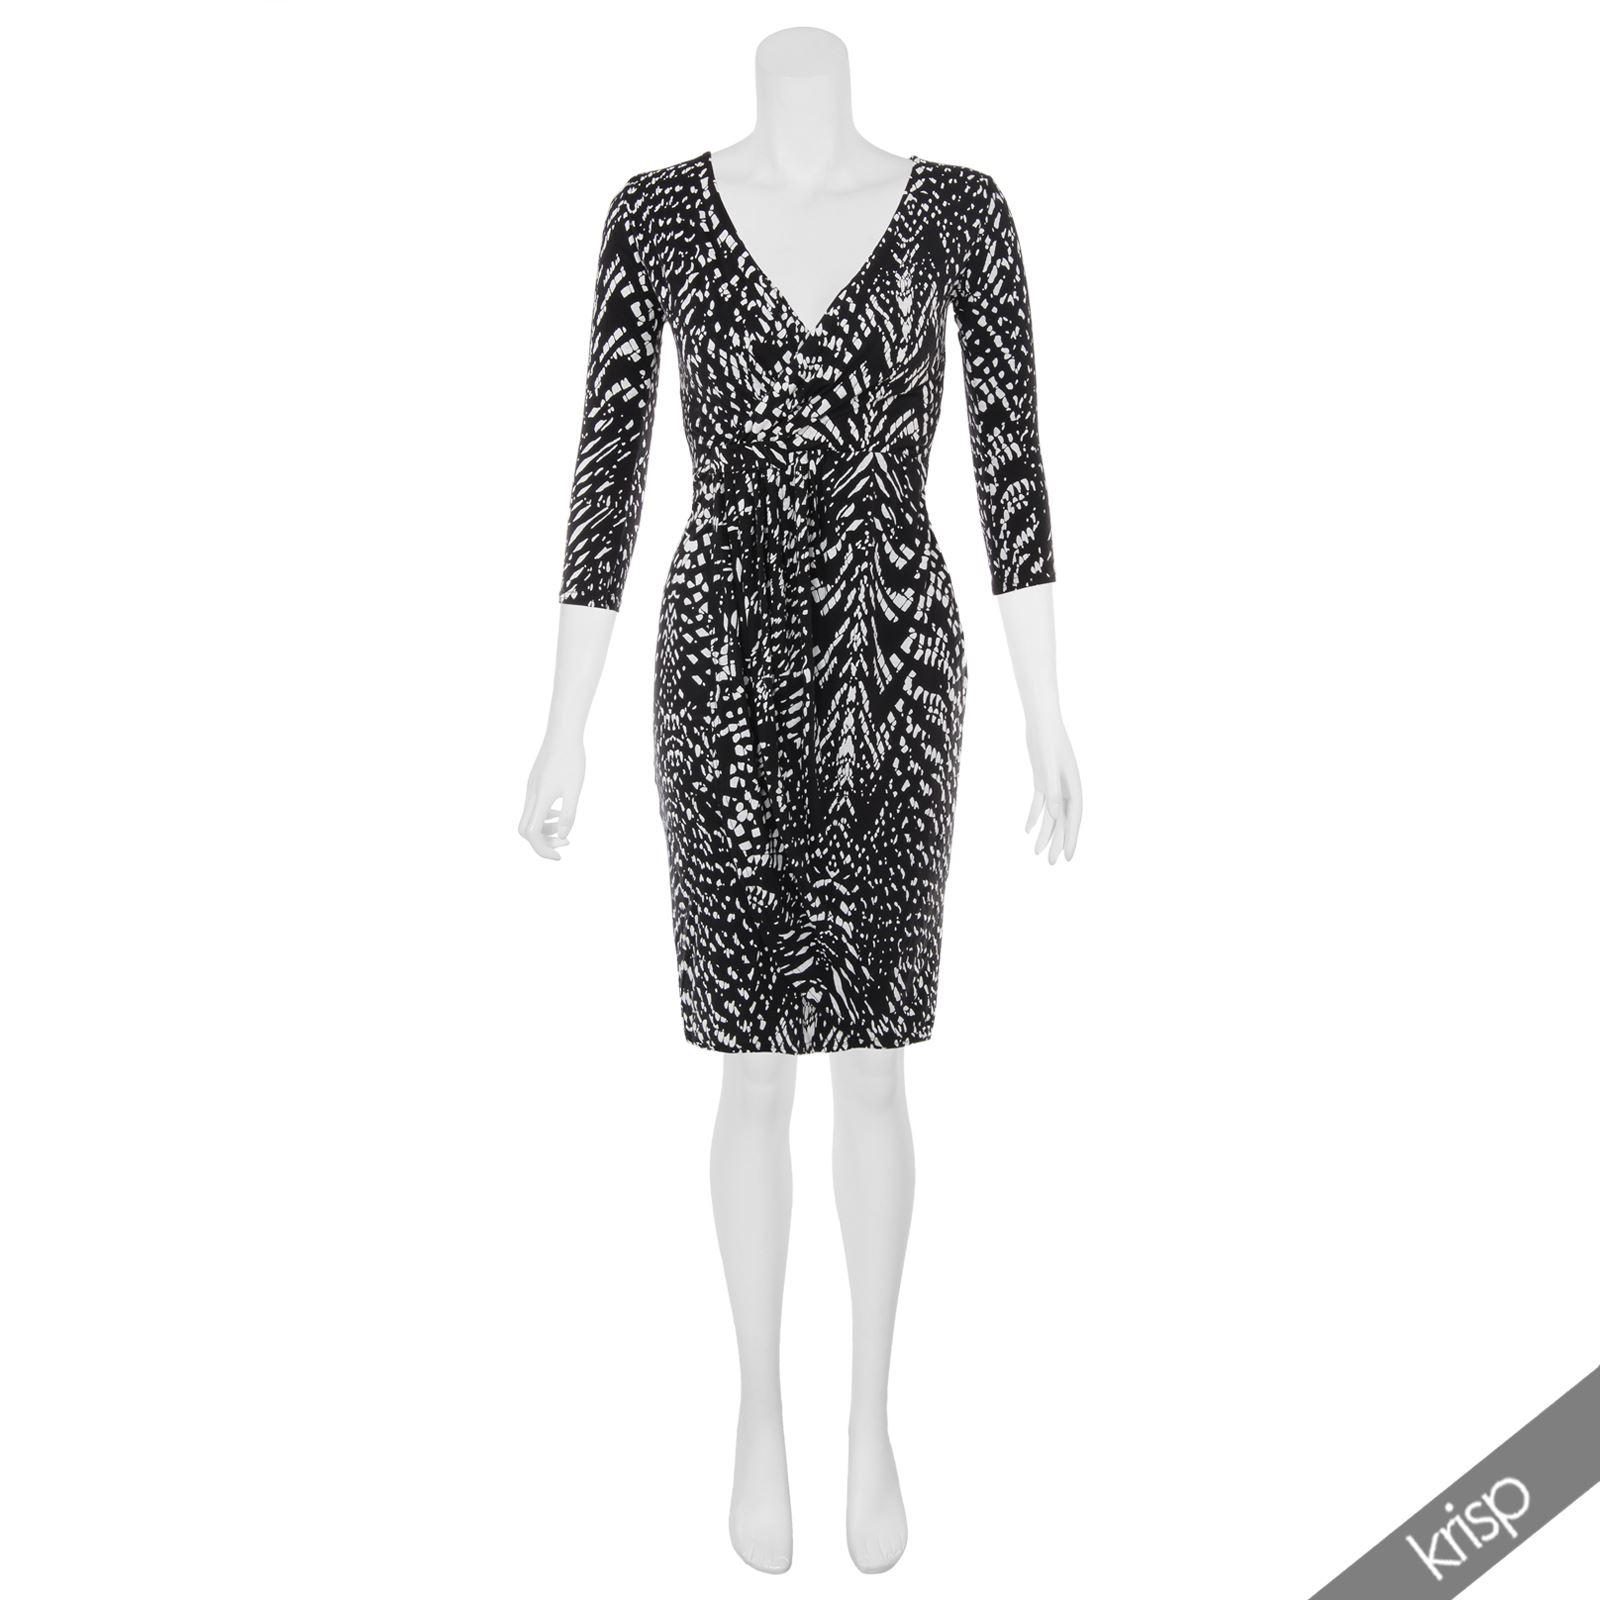 Womens-V-Neck-Dress-Top-Bodycon-Skirt-Midi-Snakeskin-Print-Cross-Over-Party-Wrap thumbnail 7